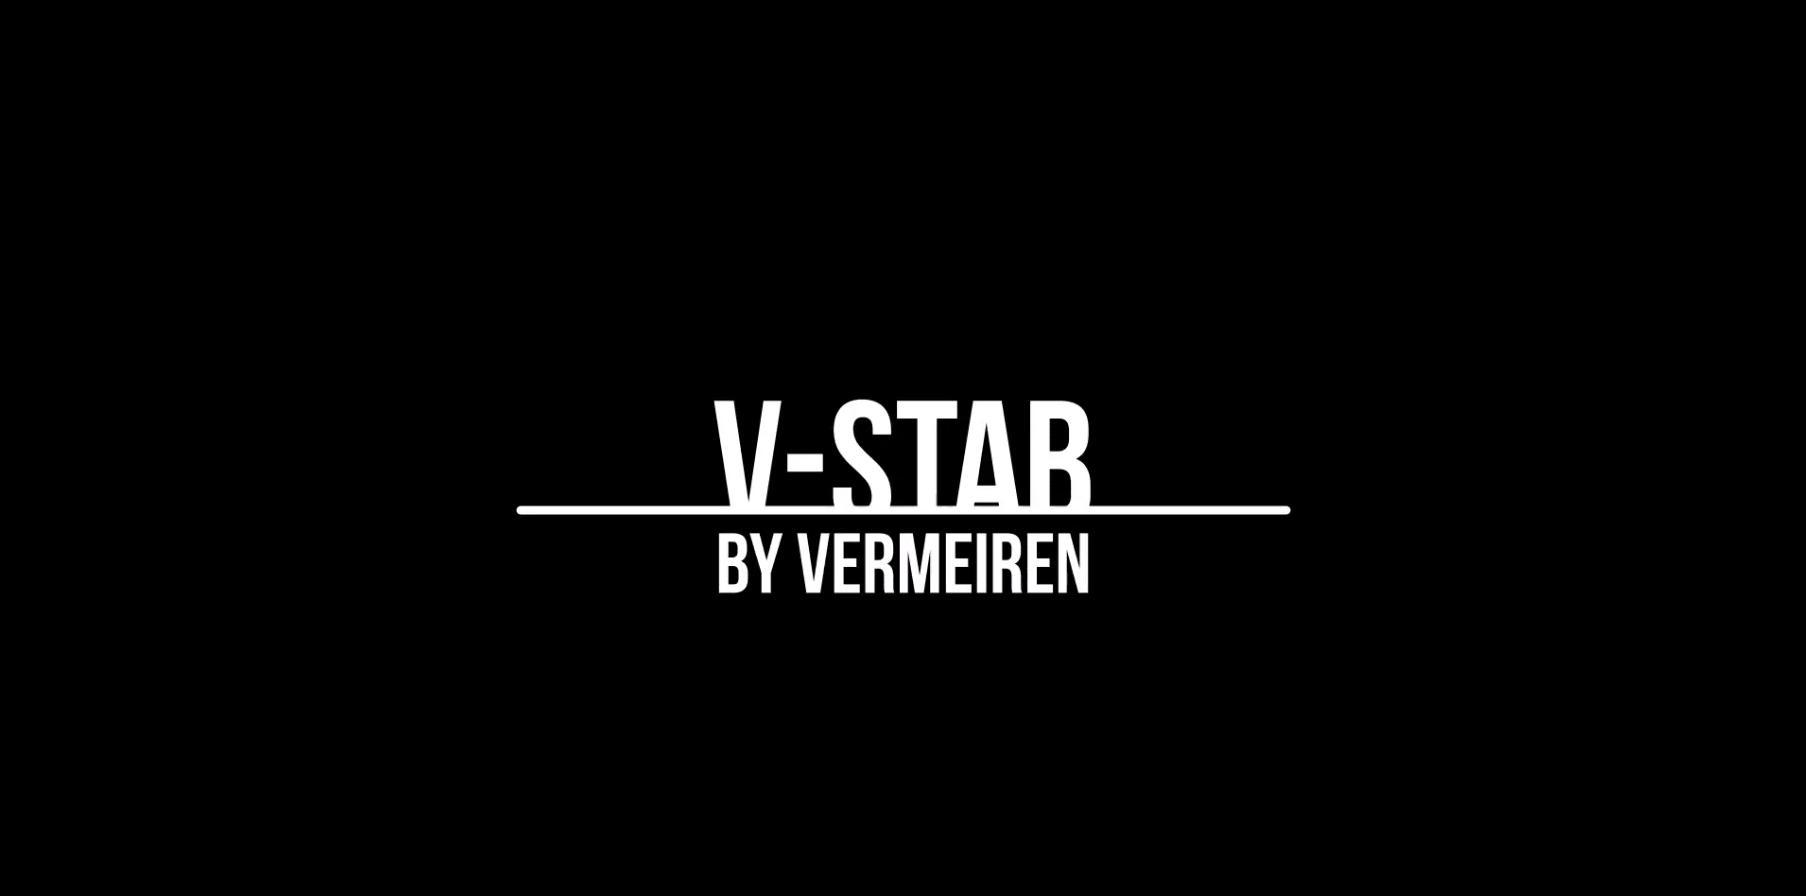 V-Stab